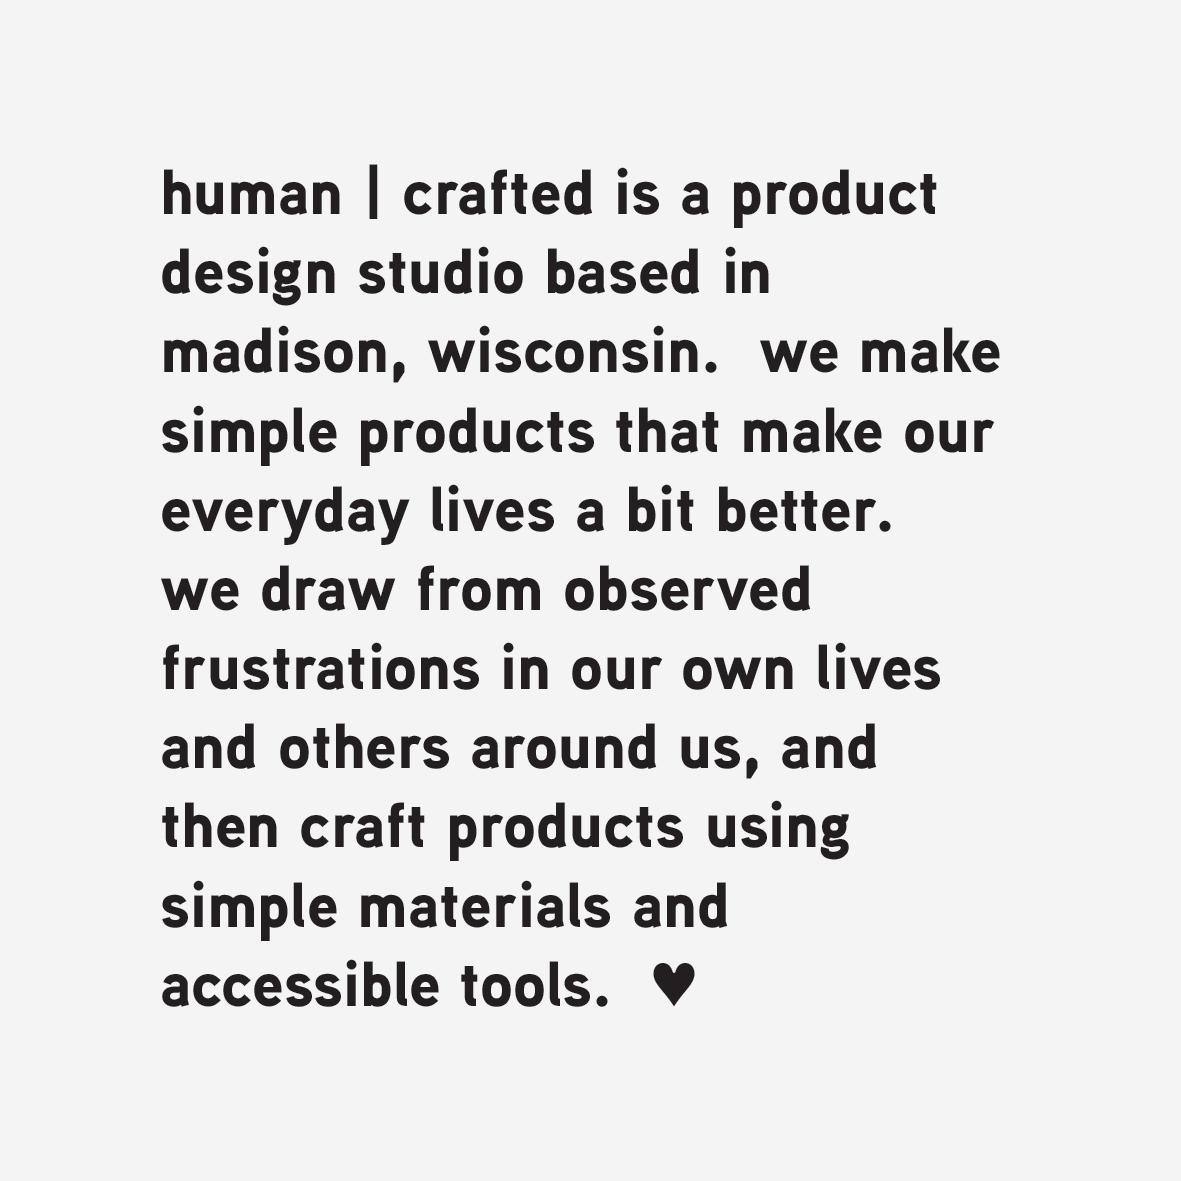 humanCraftedIs